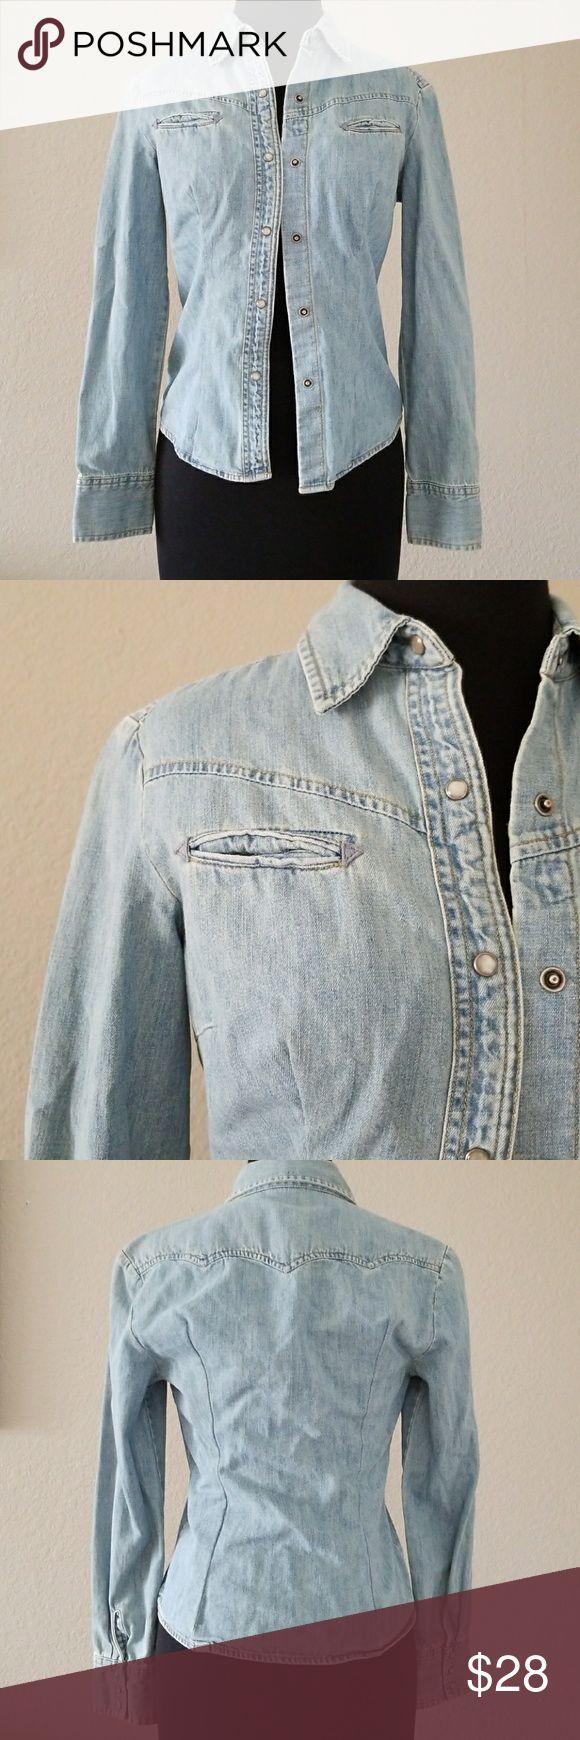 "J Crew Denim Long sleeve 100% Cotton Denim Long sleeve shirt with snap buttons.   Bust 16"" Length 22.5"" J. Crew Tops Button Down Shirts"